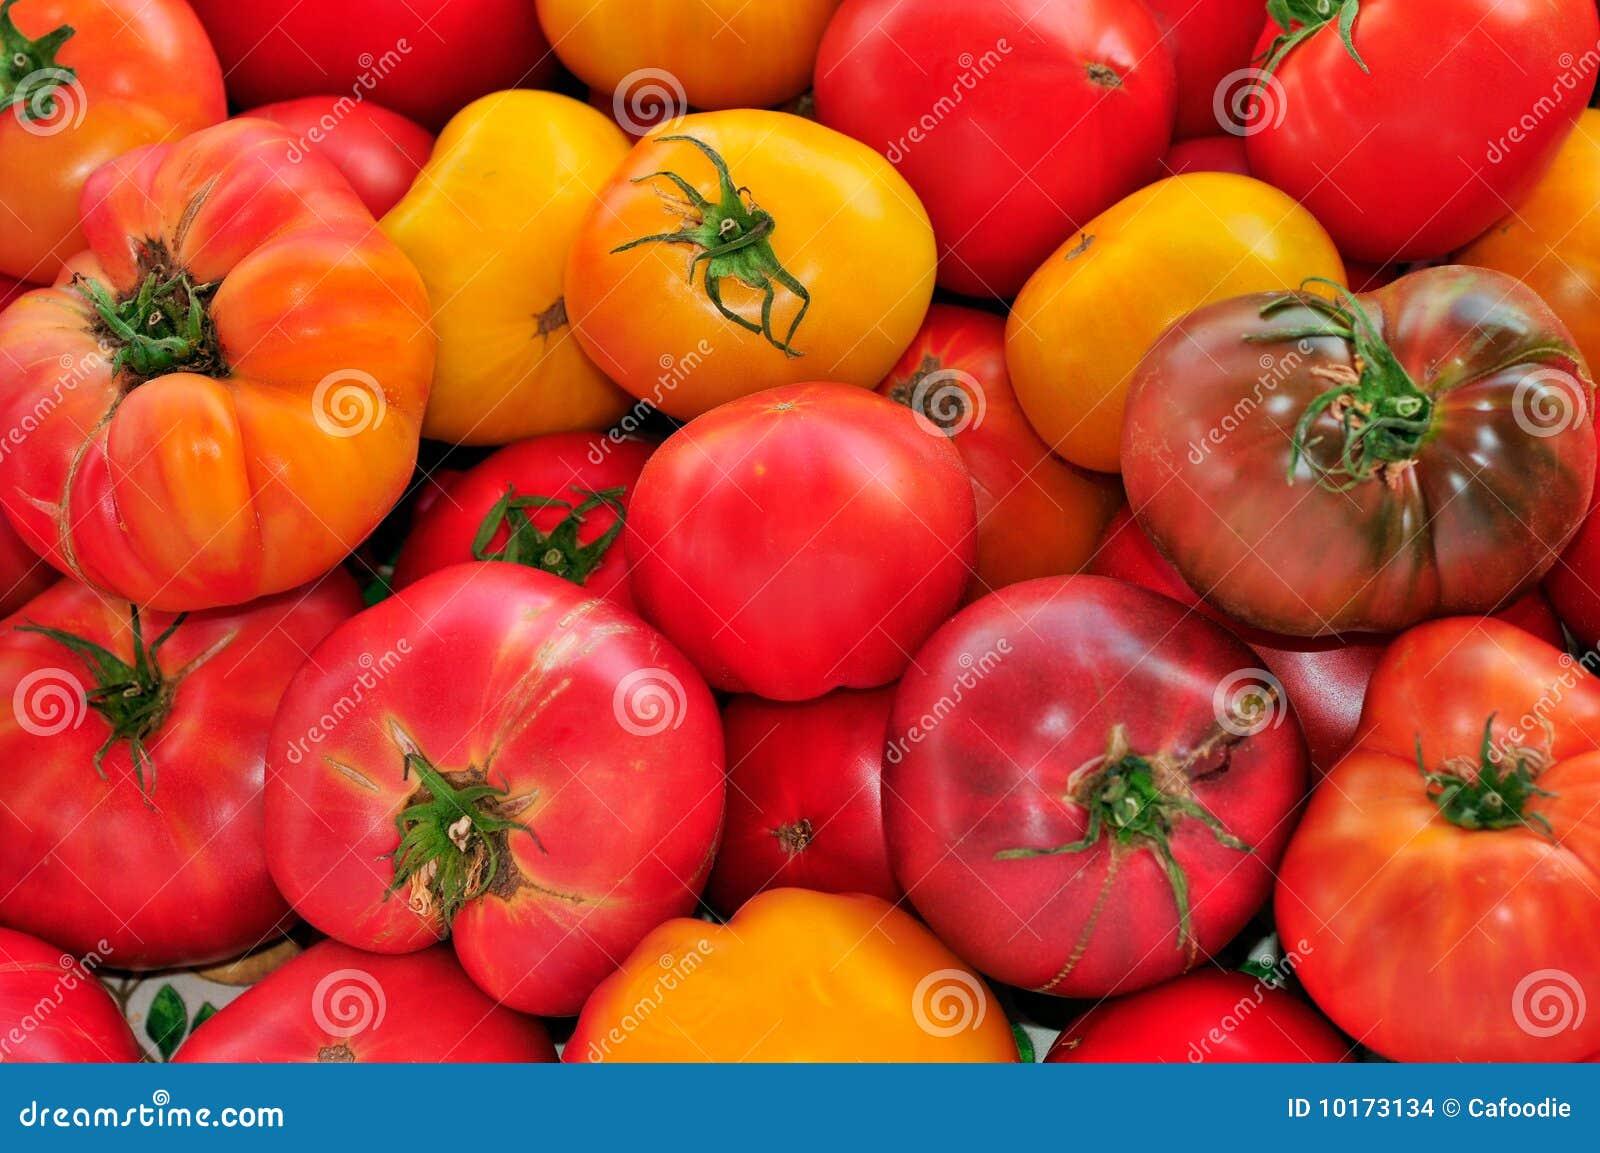 yellow heirloom tomatoes - photo #41